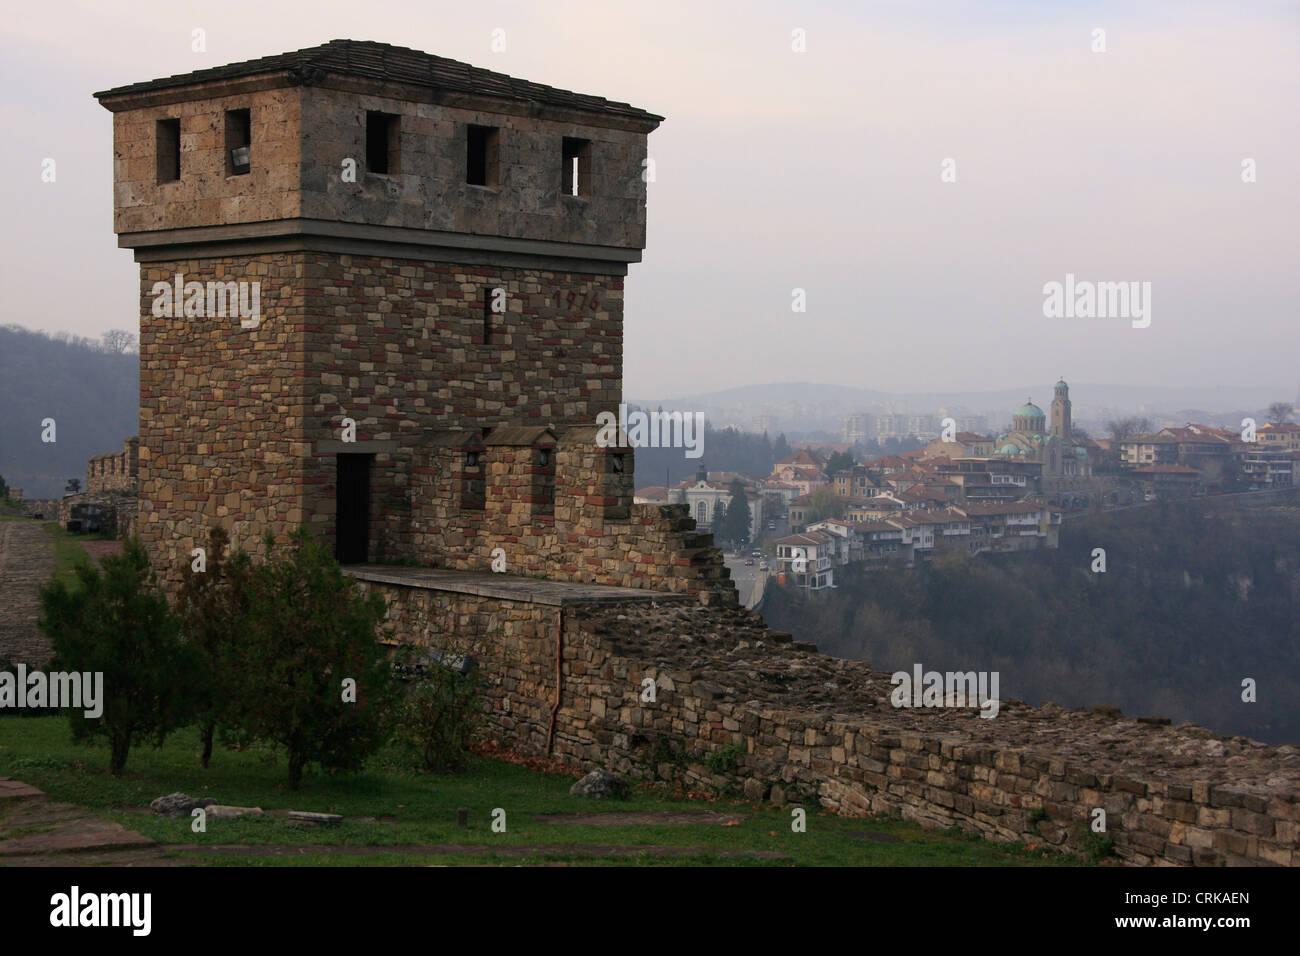 Tsarevets Medieval Fortress, Veliko Tarnovo, Bulgaria Stock Photo